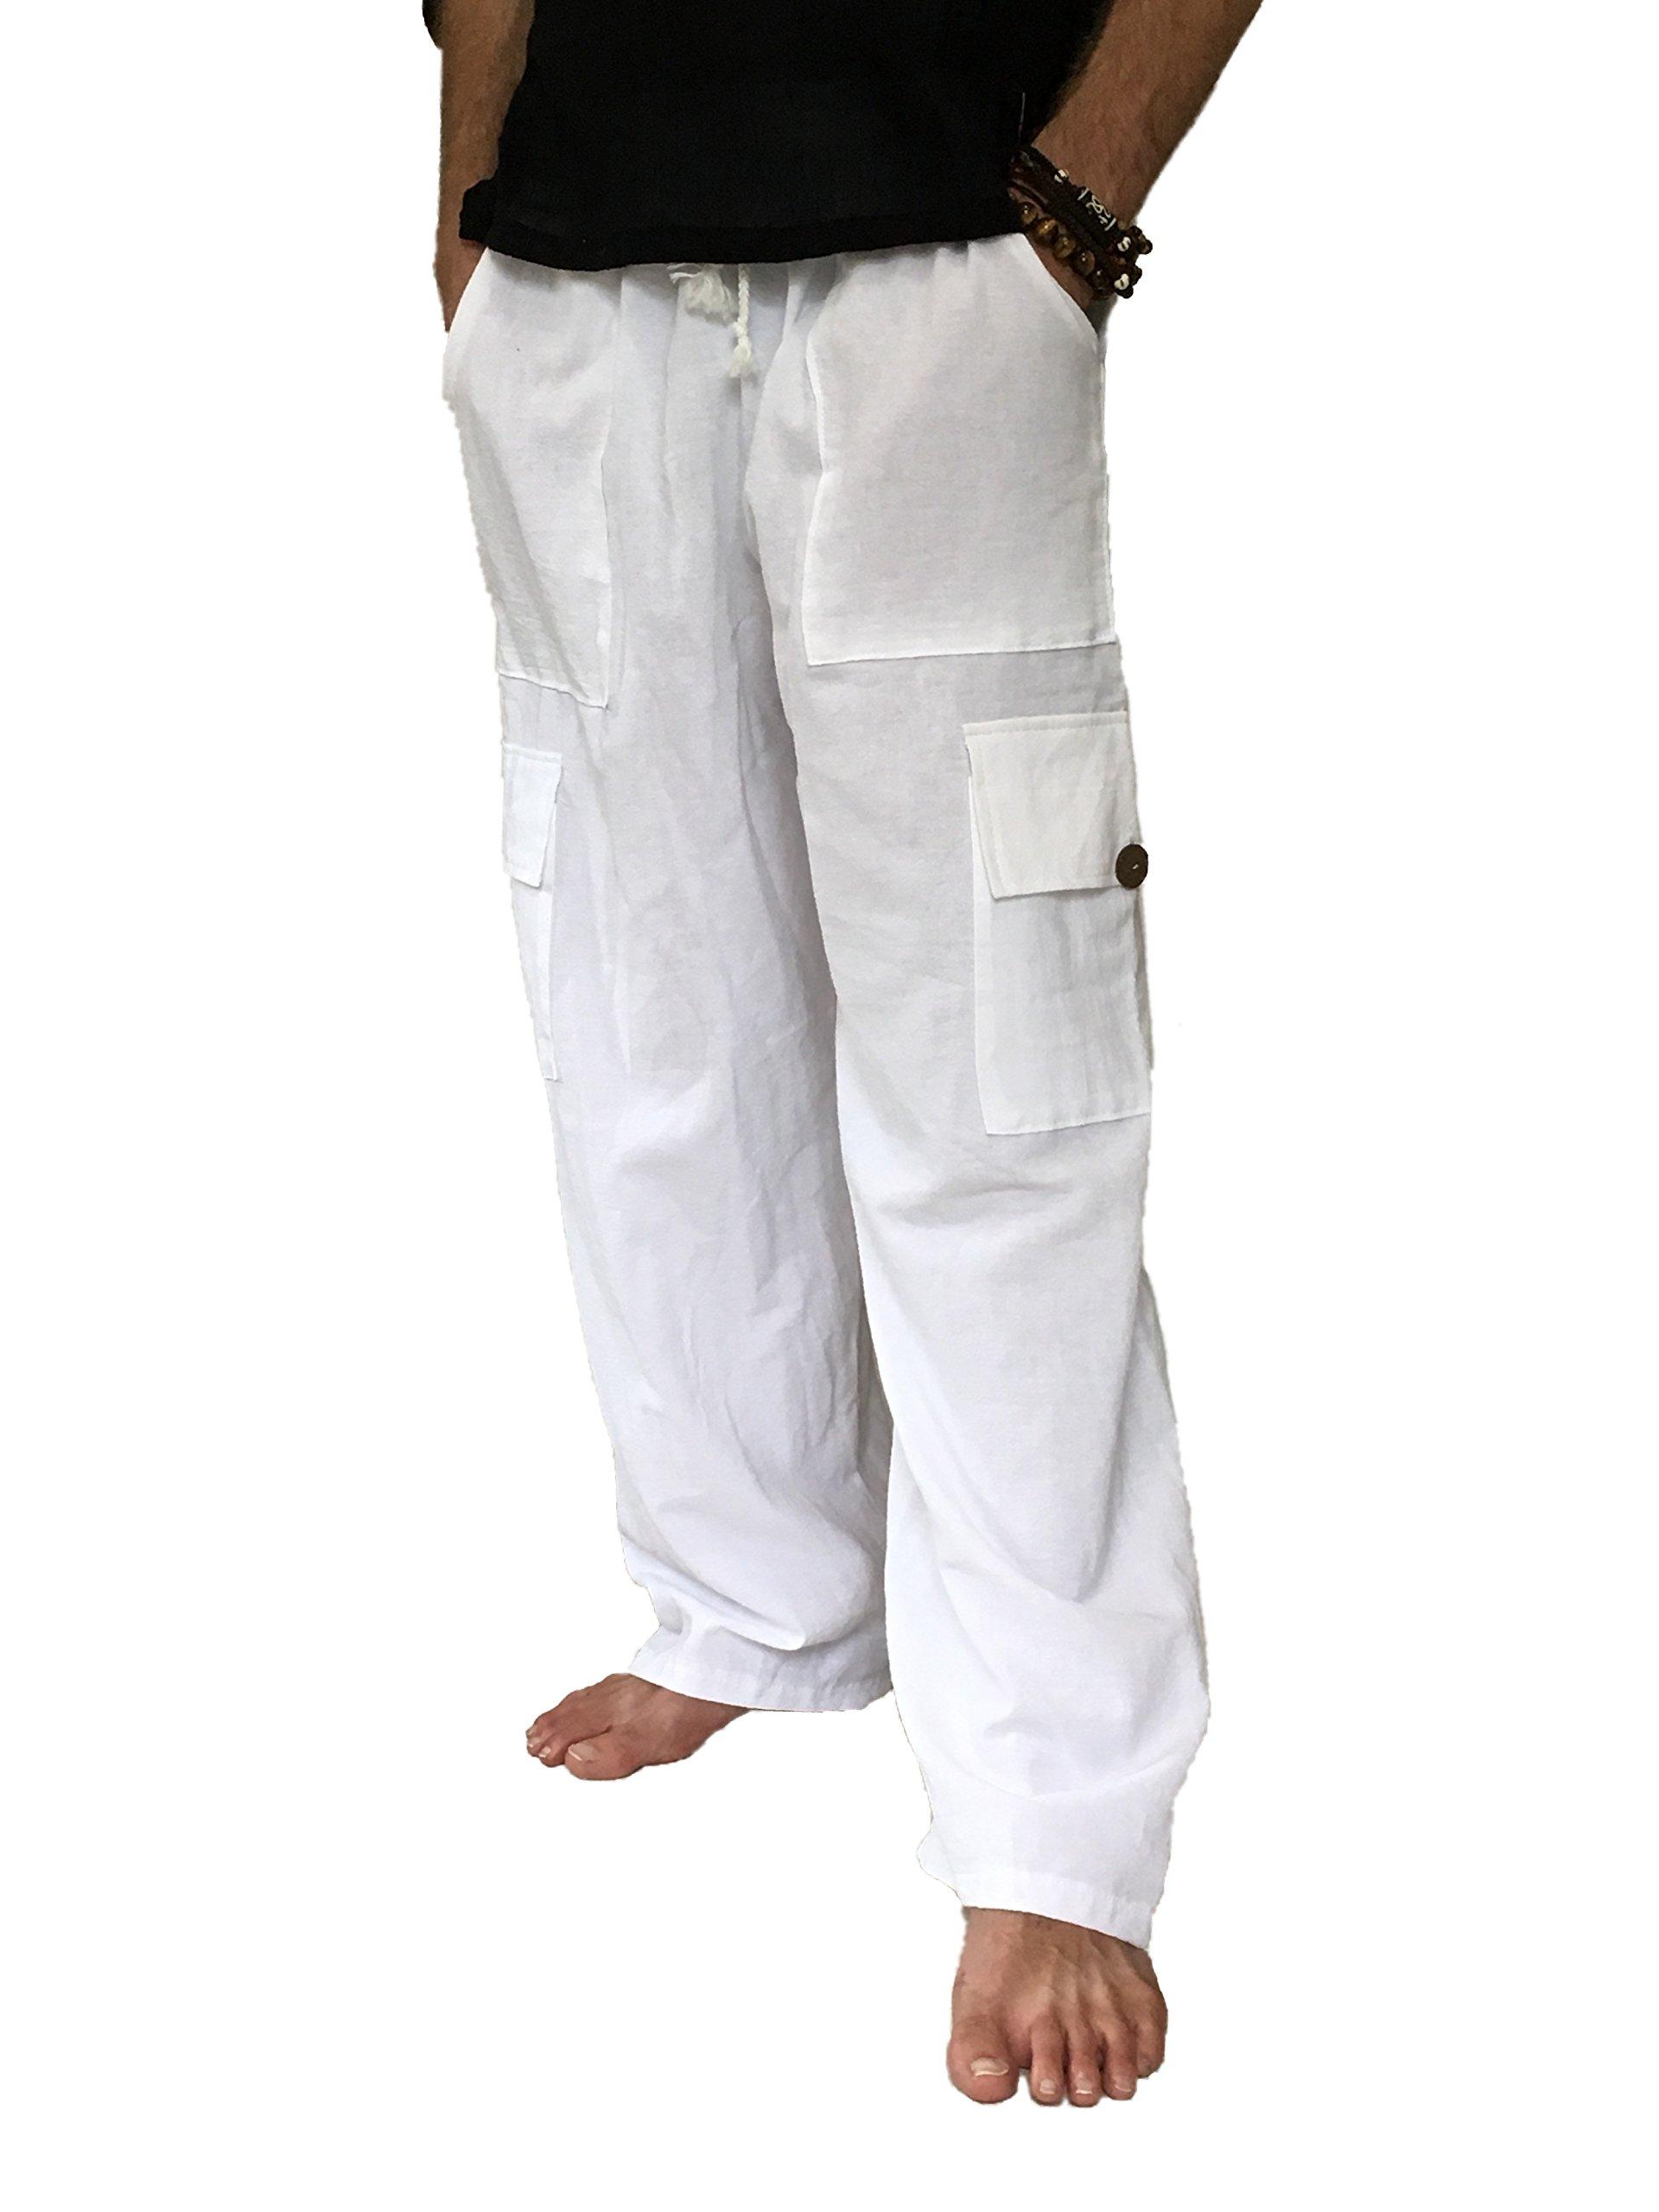 Love Quality Men's 100% Cotton Cargo Pants Plus Size Baggy Pants Drawstring Elastic Waist (White) by Love Quality (Image #1)